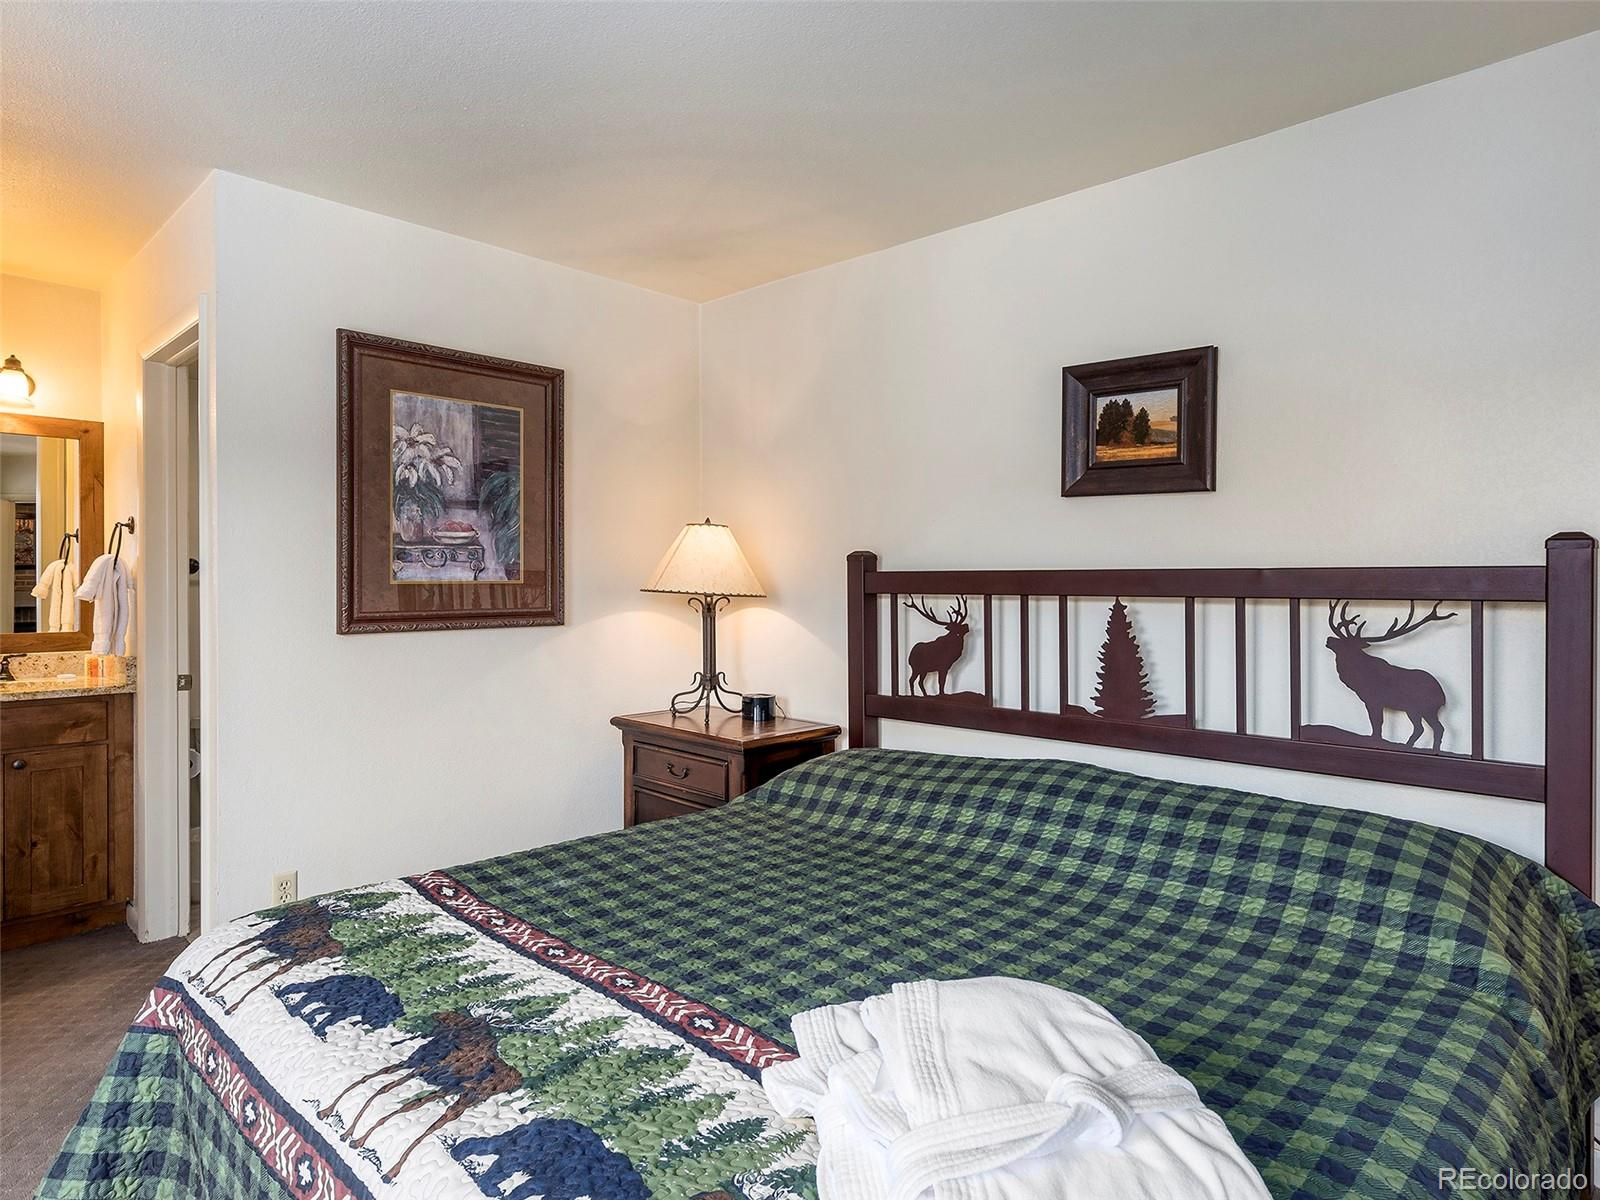 MLS# 4193338 - 9 - 2700 Village Drive #D-204, Steamboat Springs, CO 80487